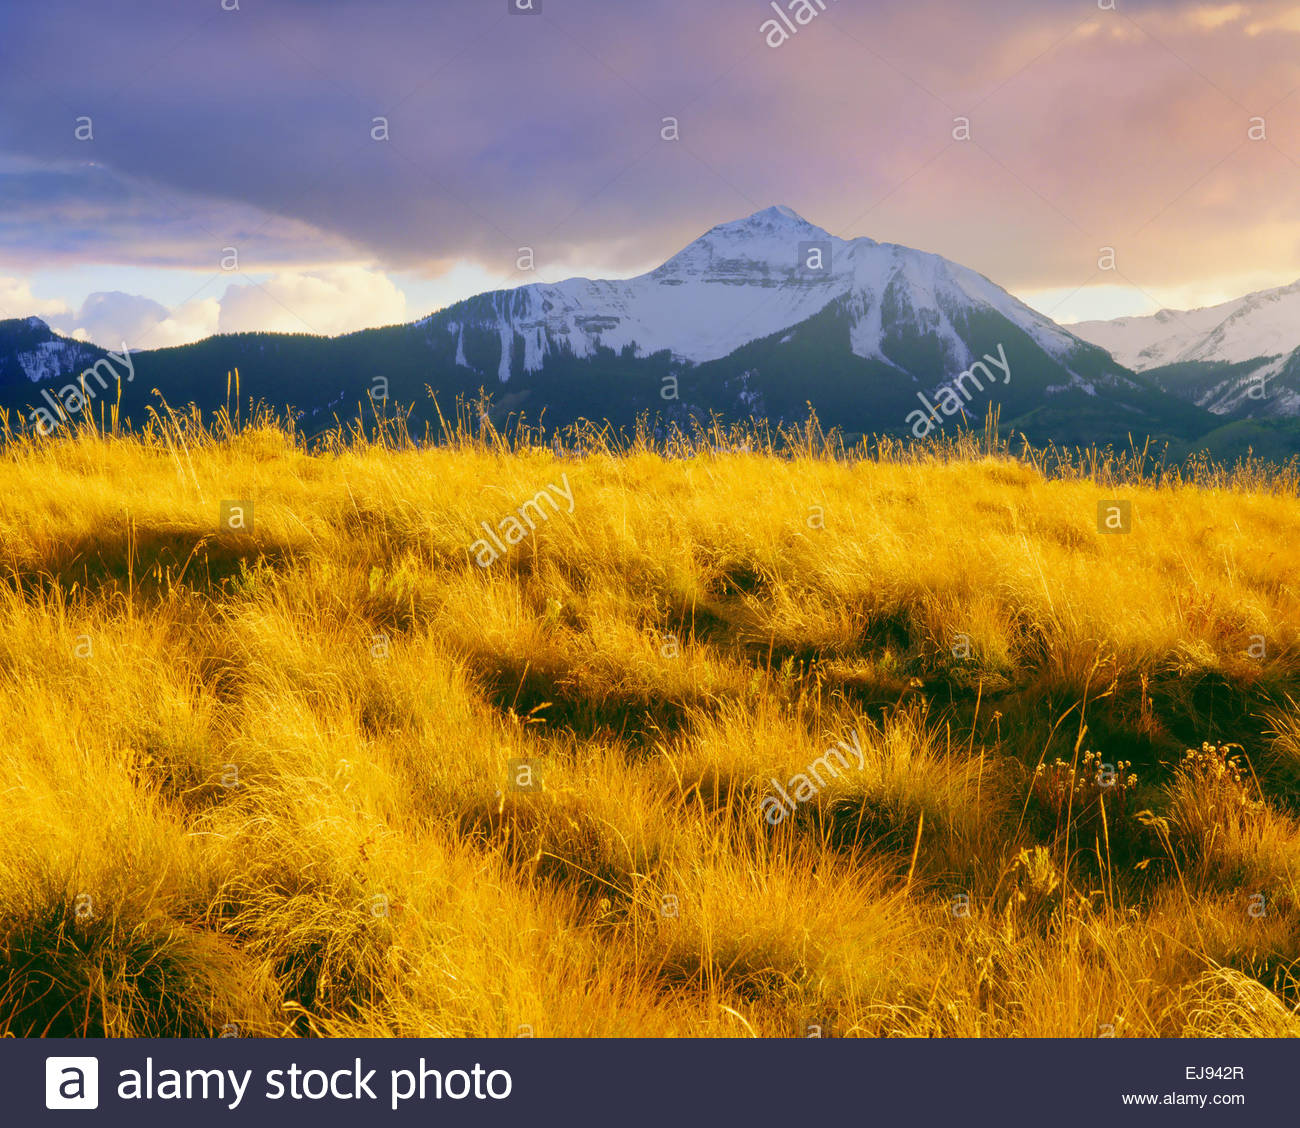 'Sunshine Mountain' autumn 'San Juan Mountains'  'Uncompahgre National Forest' Colorado - Stock Image